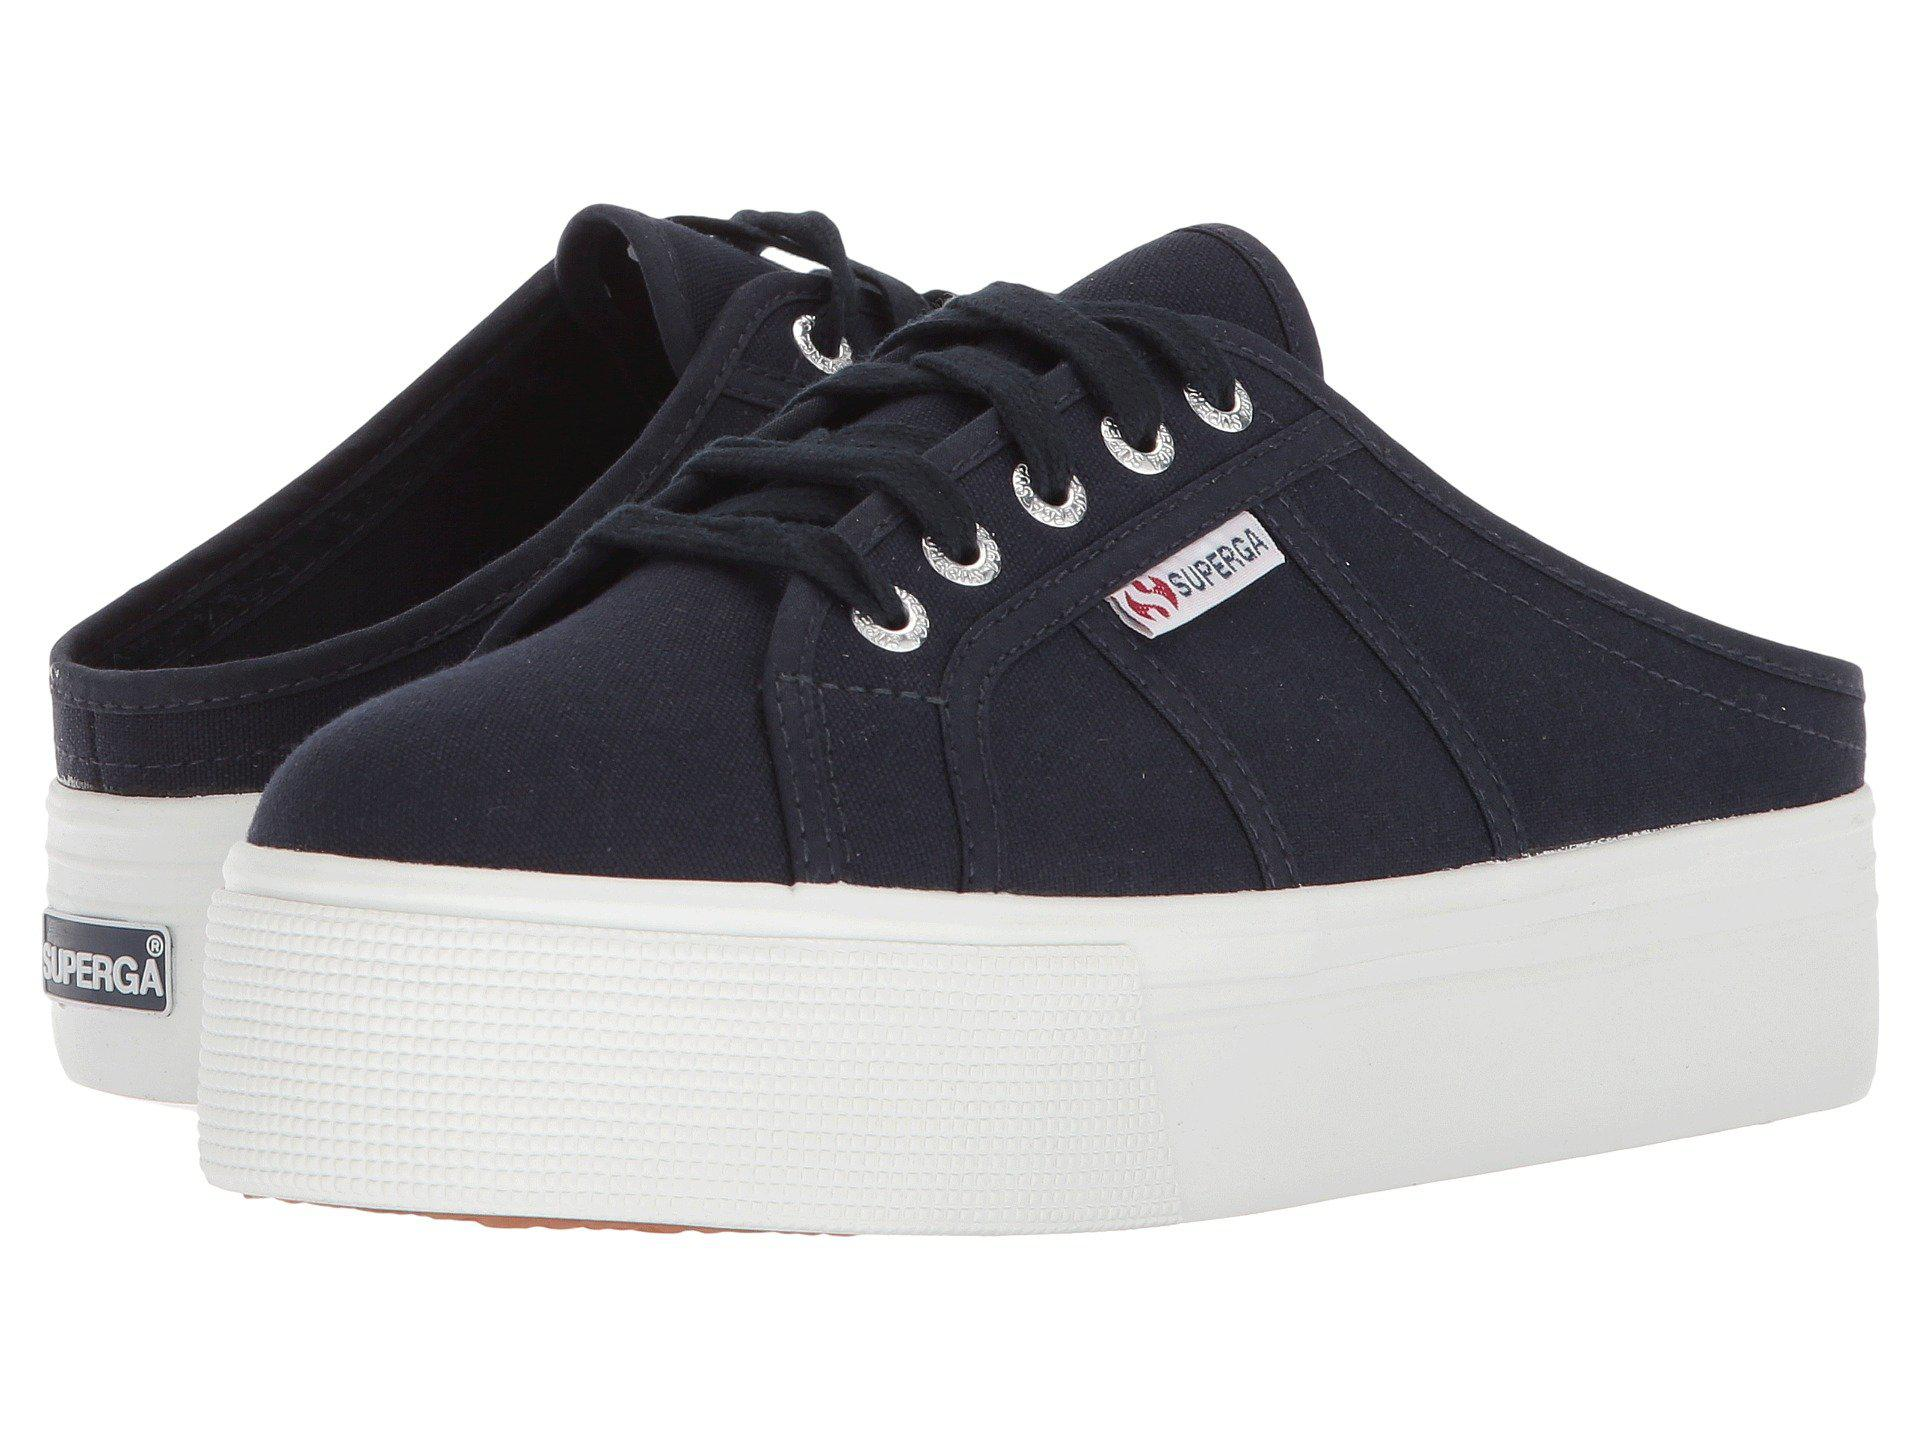 Superga2284 Vcotw Platform Sneaker Mule